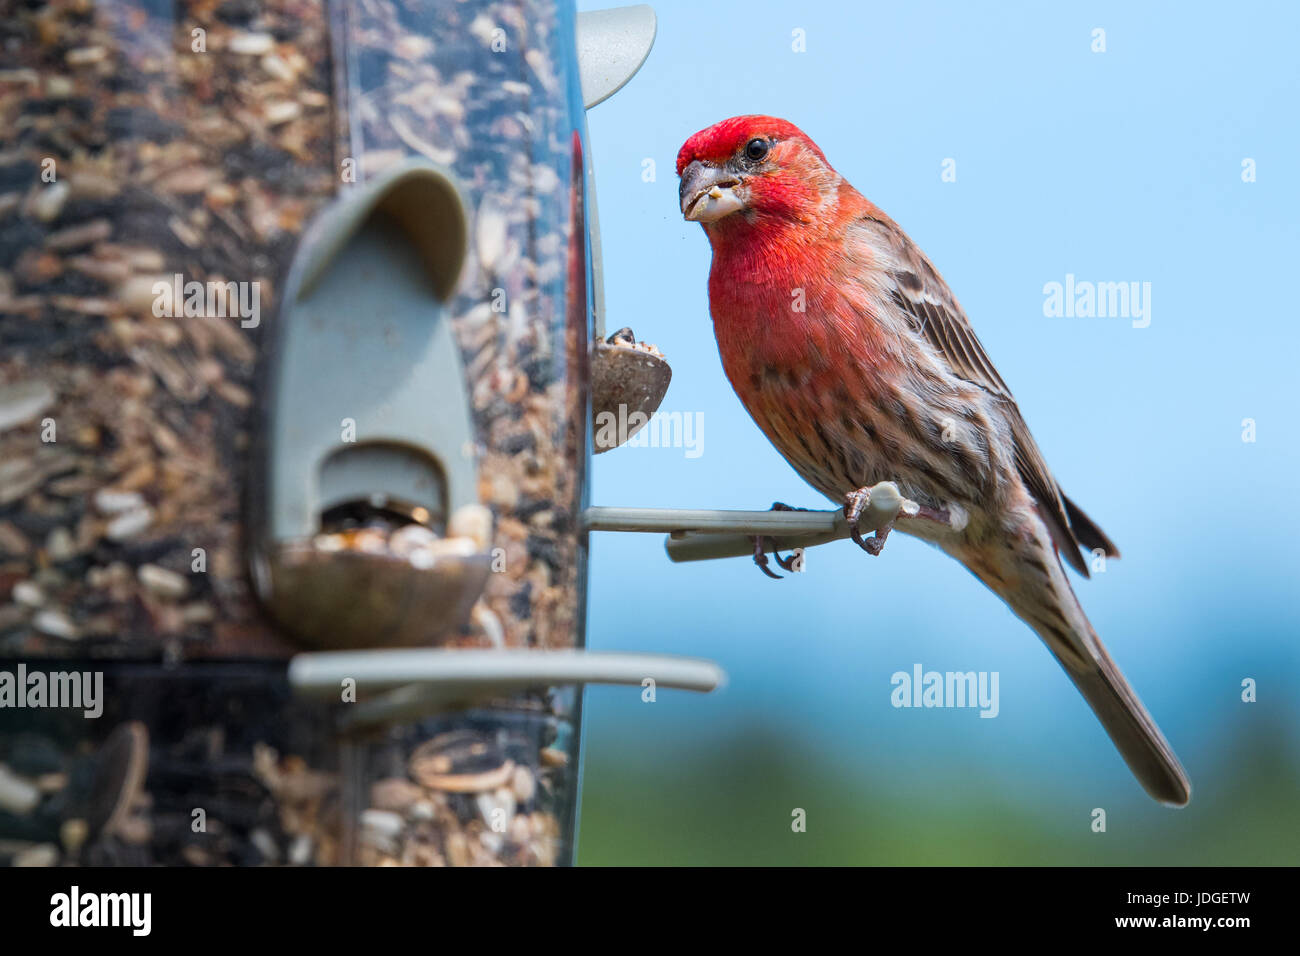 Beautiful male House Finch (Haemorhous mexicanus) eats at a backyard bird feeder. - Stock Image